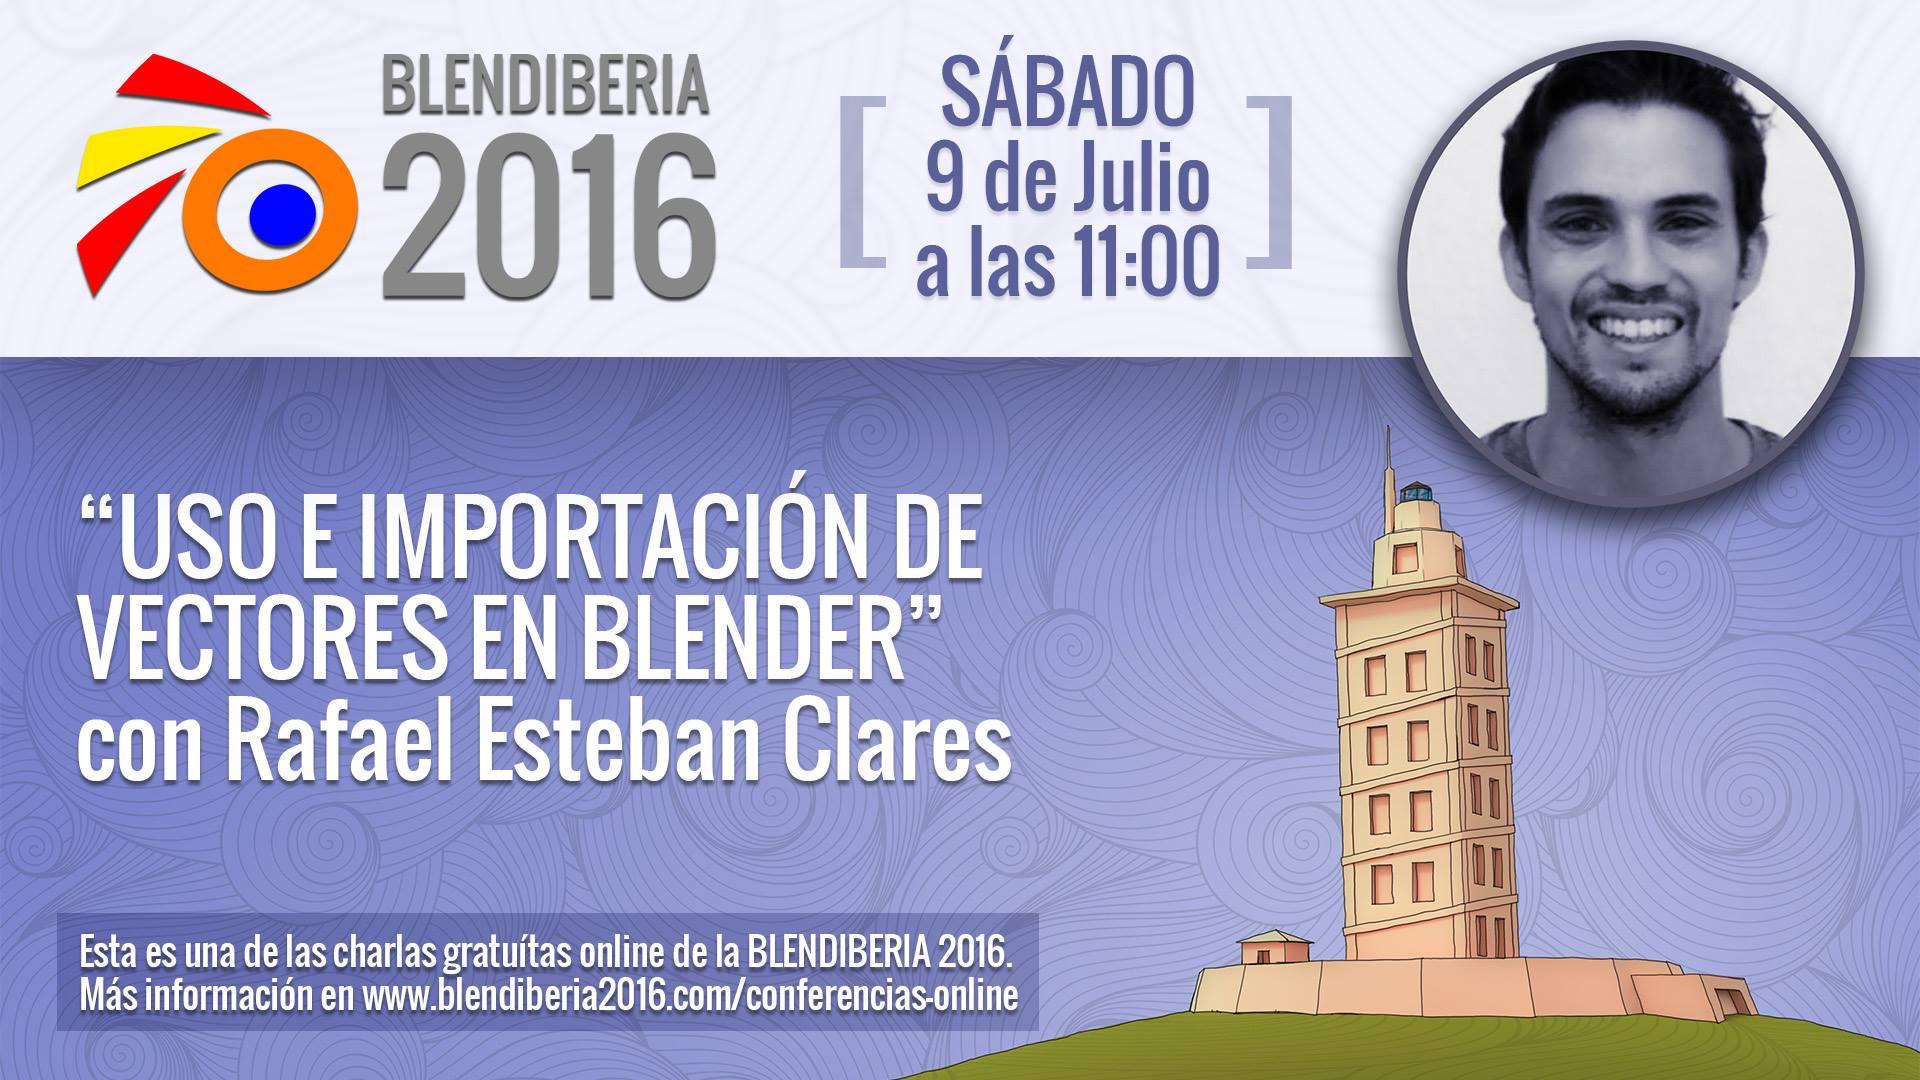 Blendiberia 2016-sabado_11.jpg